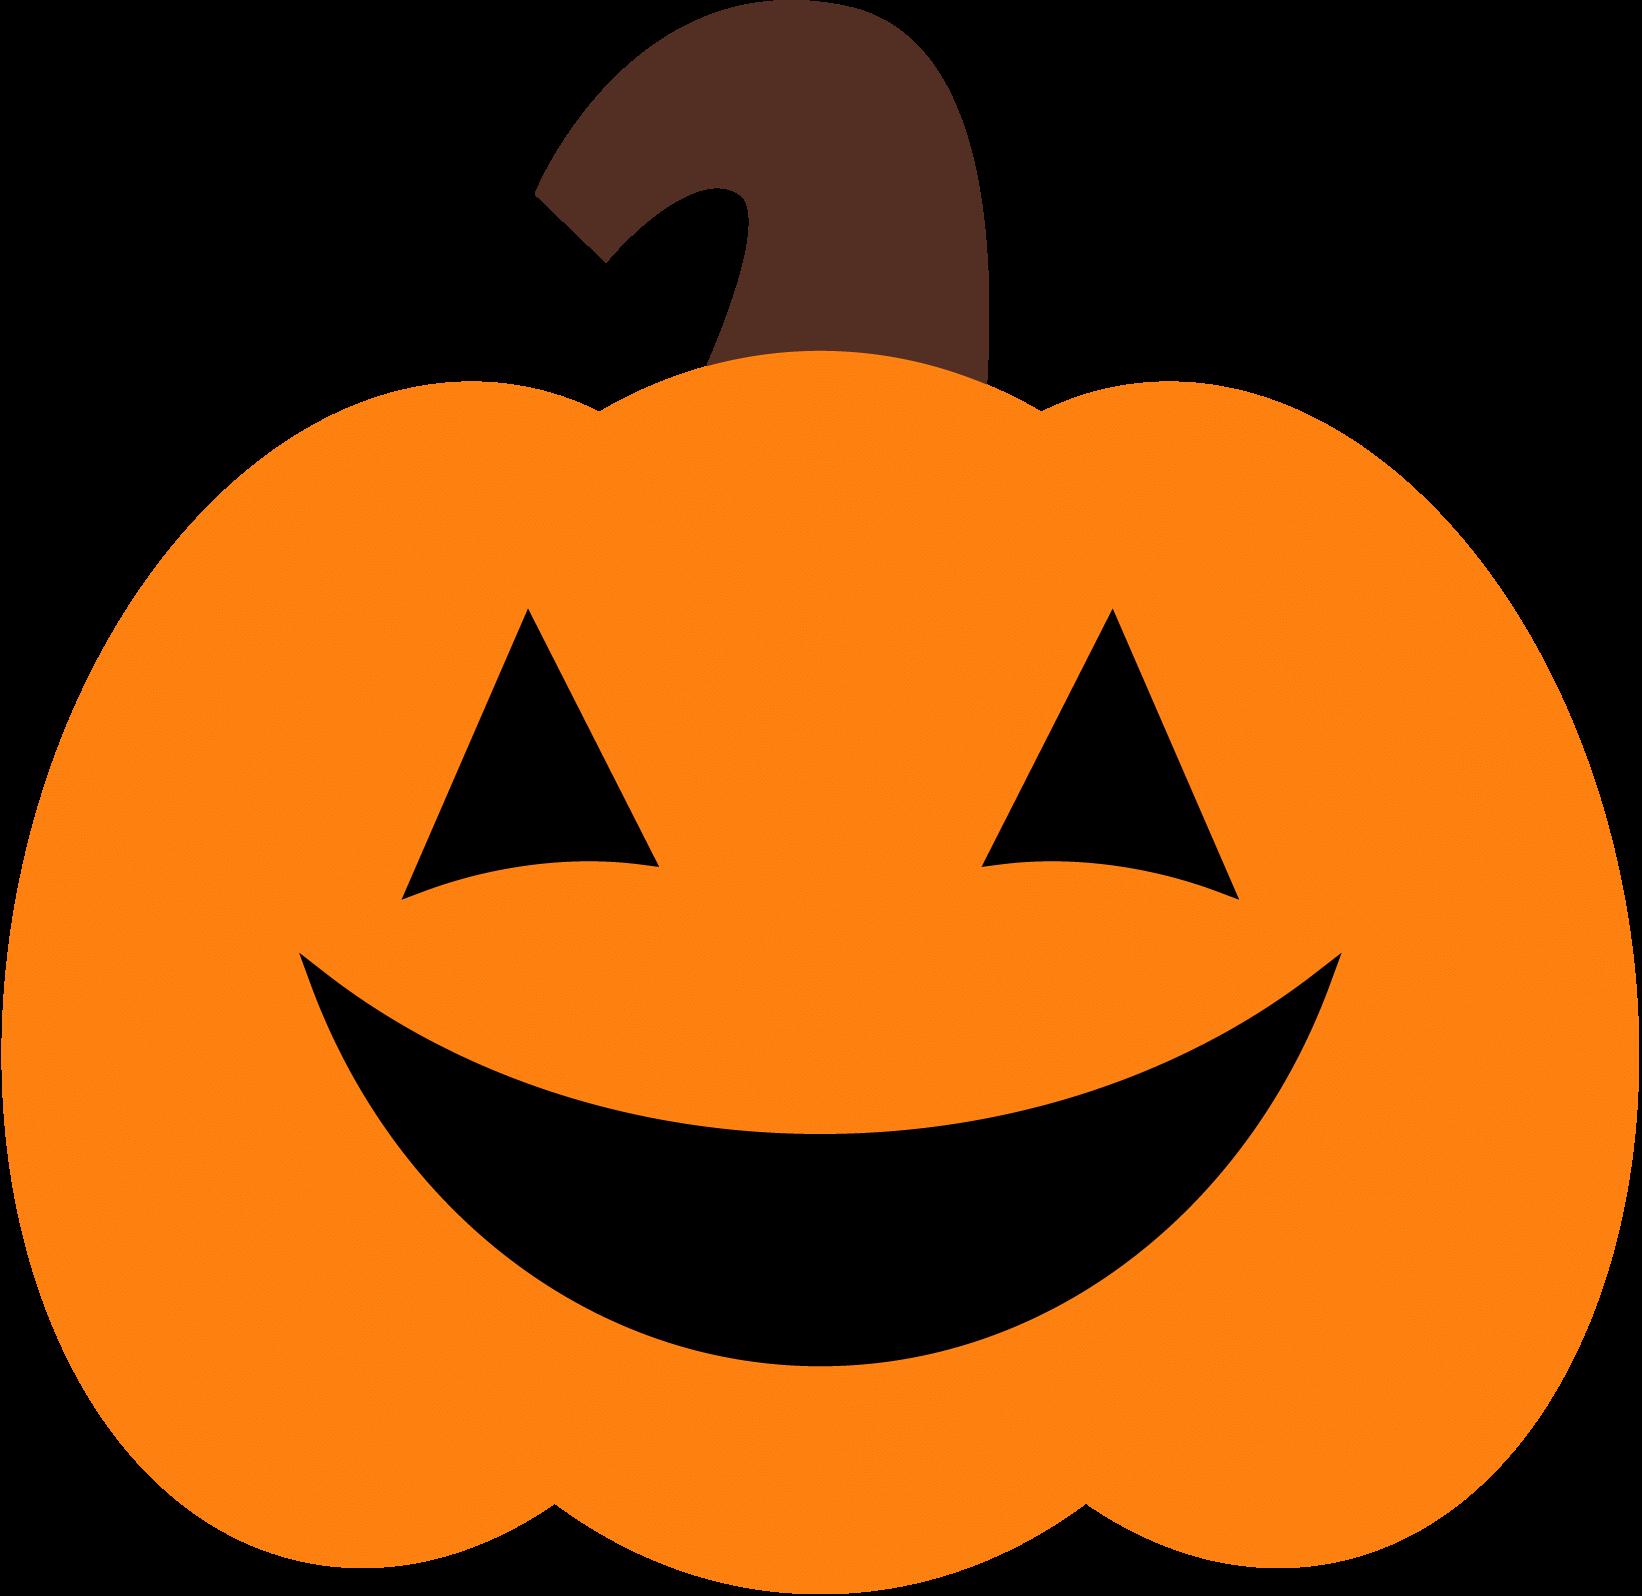 Single pumpkin clipart image download Free Cute Number 4 Cliparts, Download Free Clip Art, Free Clip Art ... image download